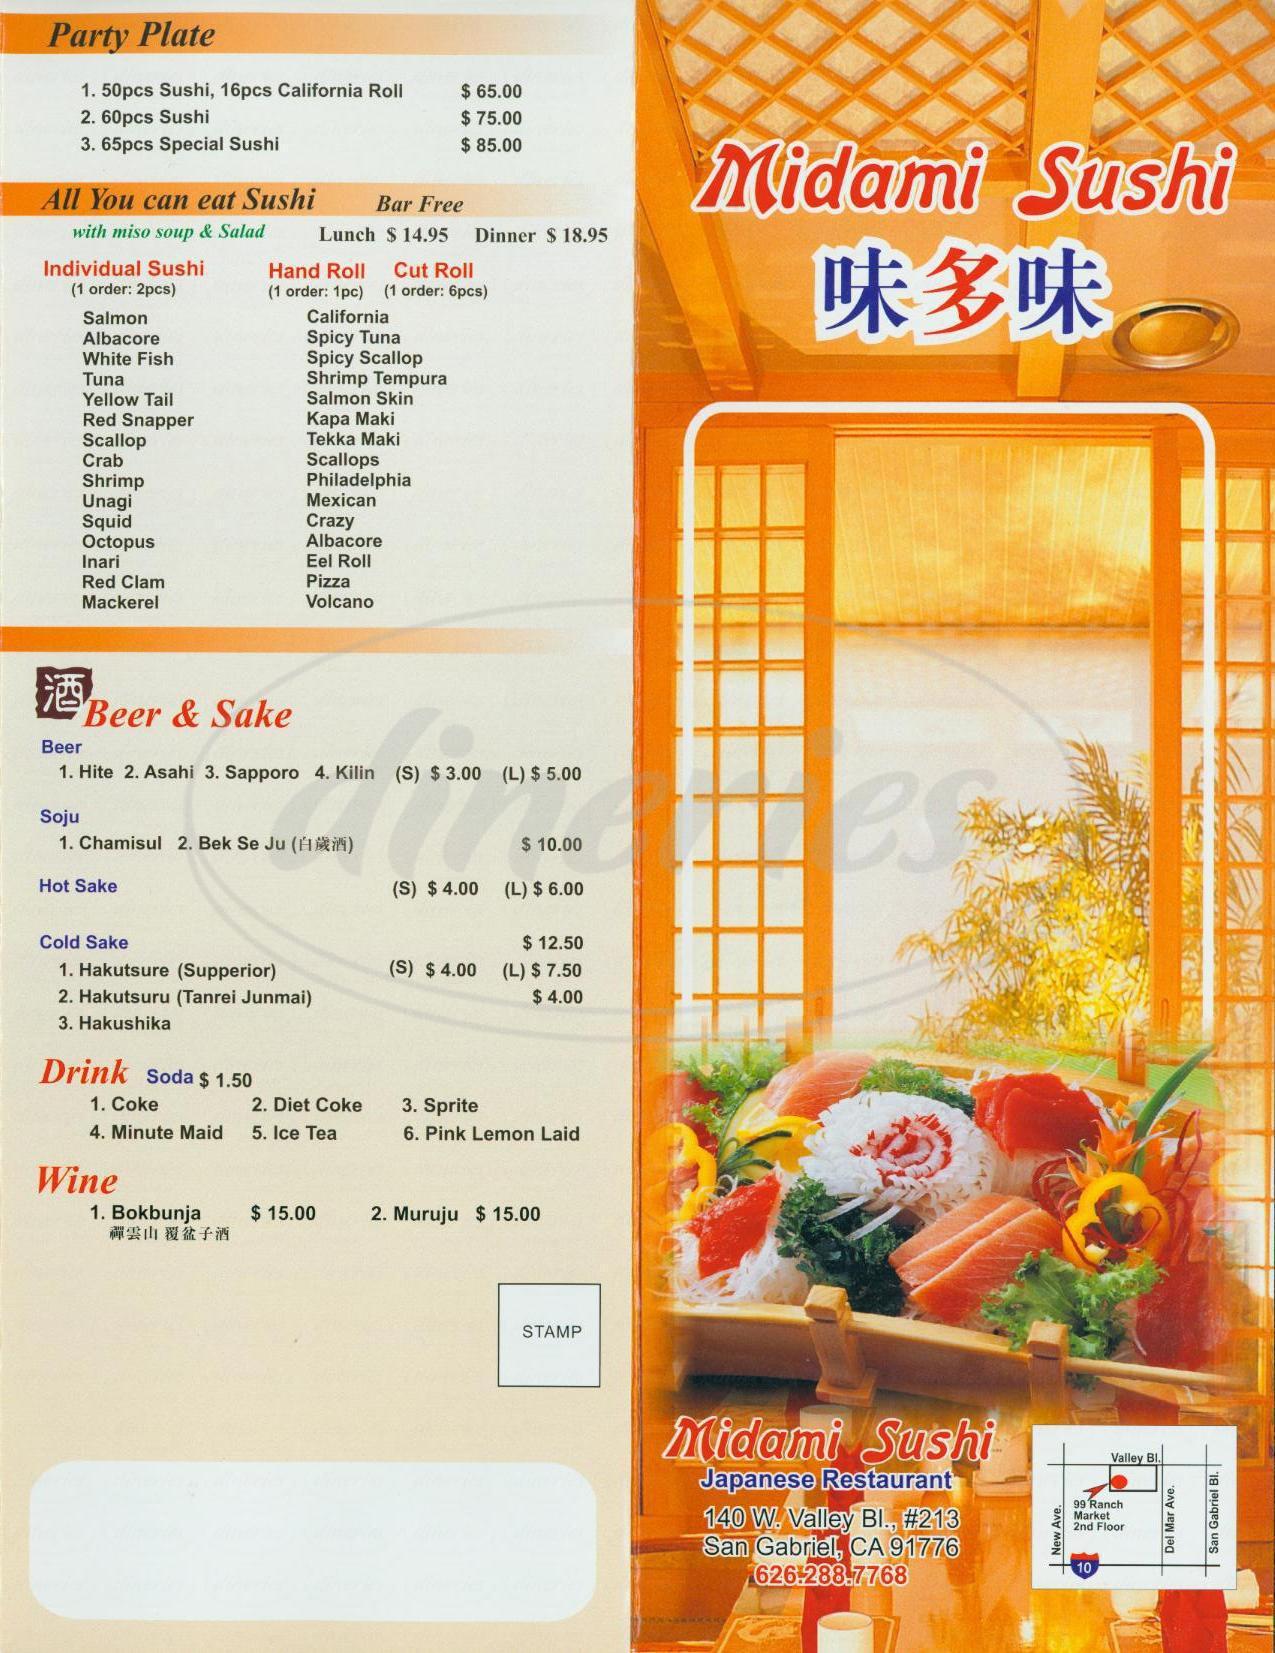 menu for Midami Sushi